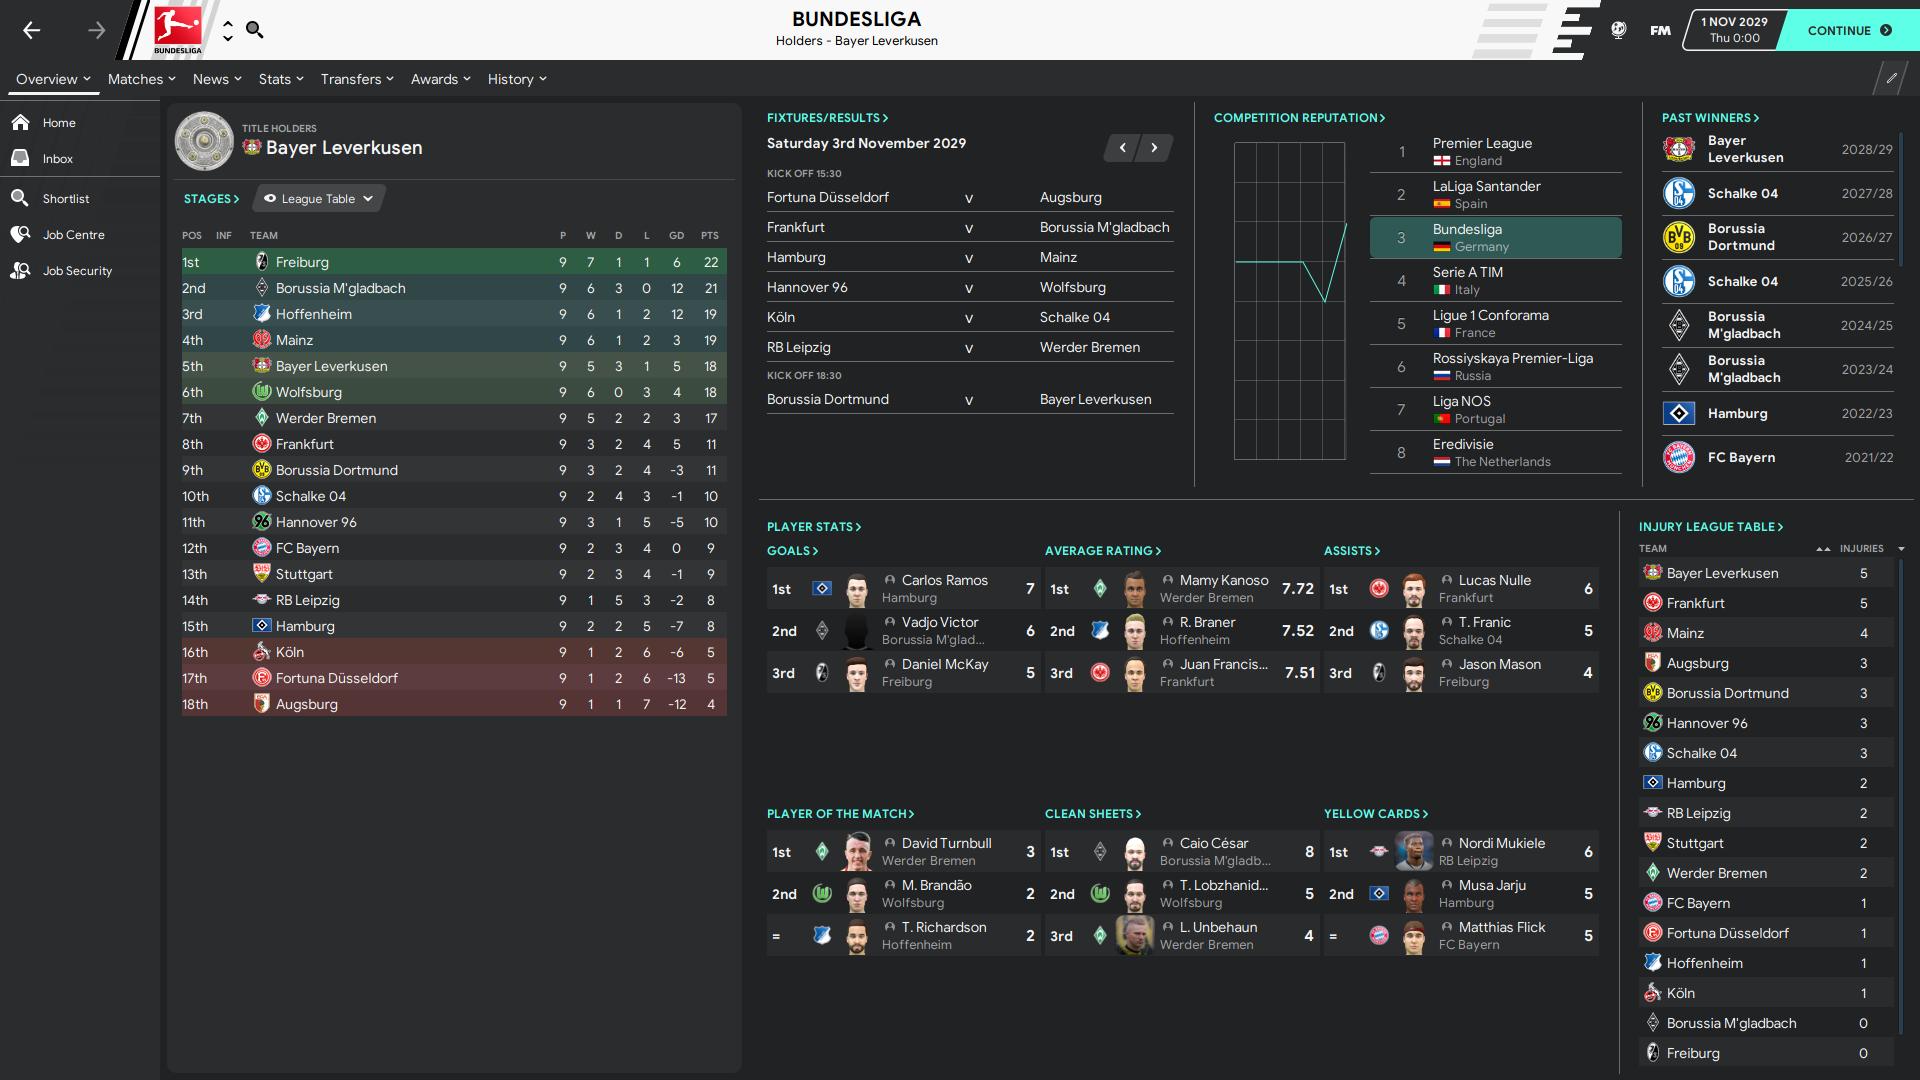 Bundesliga_ Profile.png